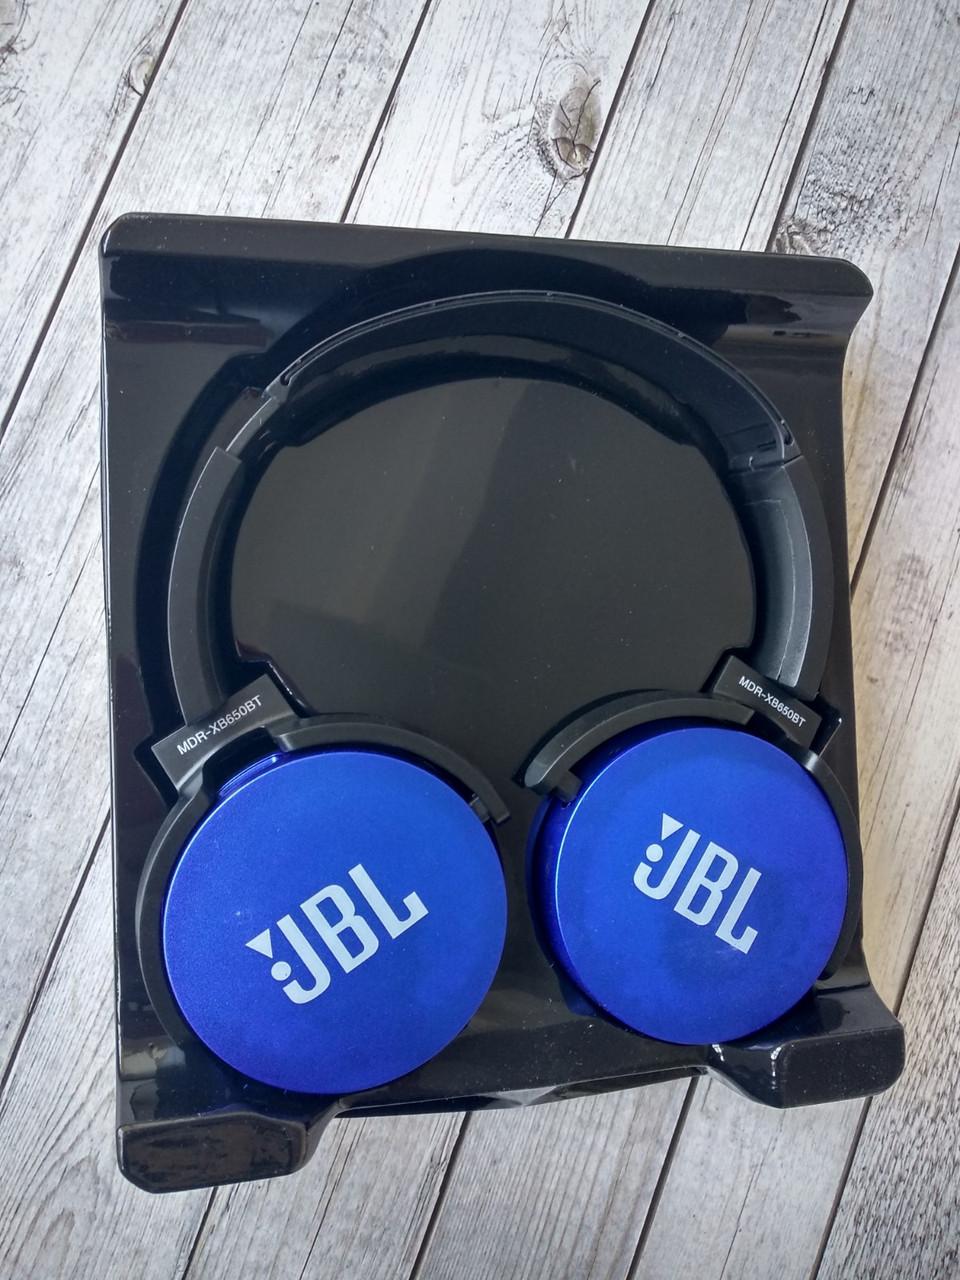 Беспроводные наушники Bluetooth-гарнитура JBL (Copy) by Harman MDR-XB 650 BT STEREO(слот micro SD, кнопки